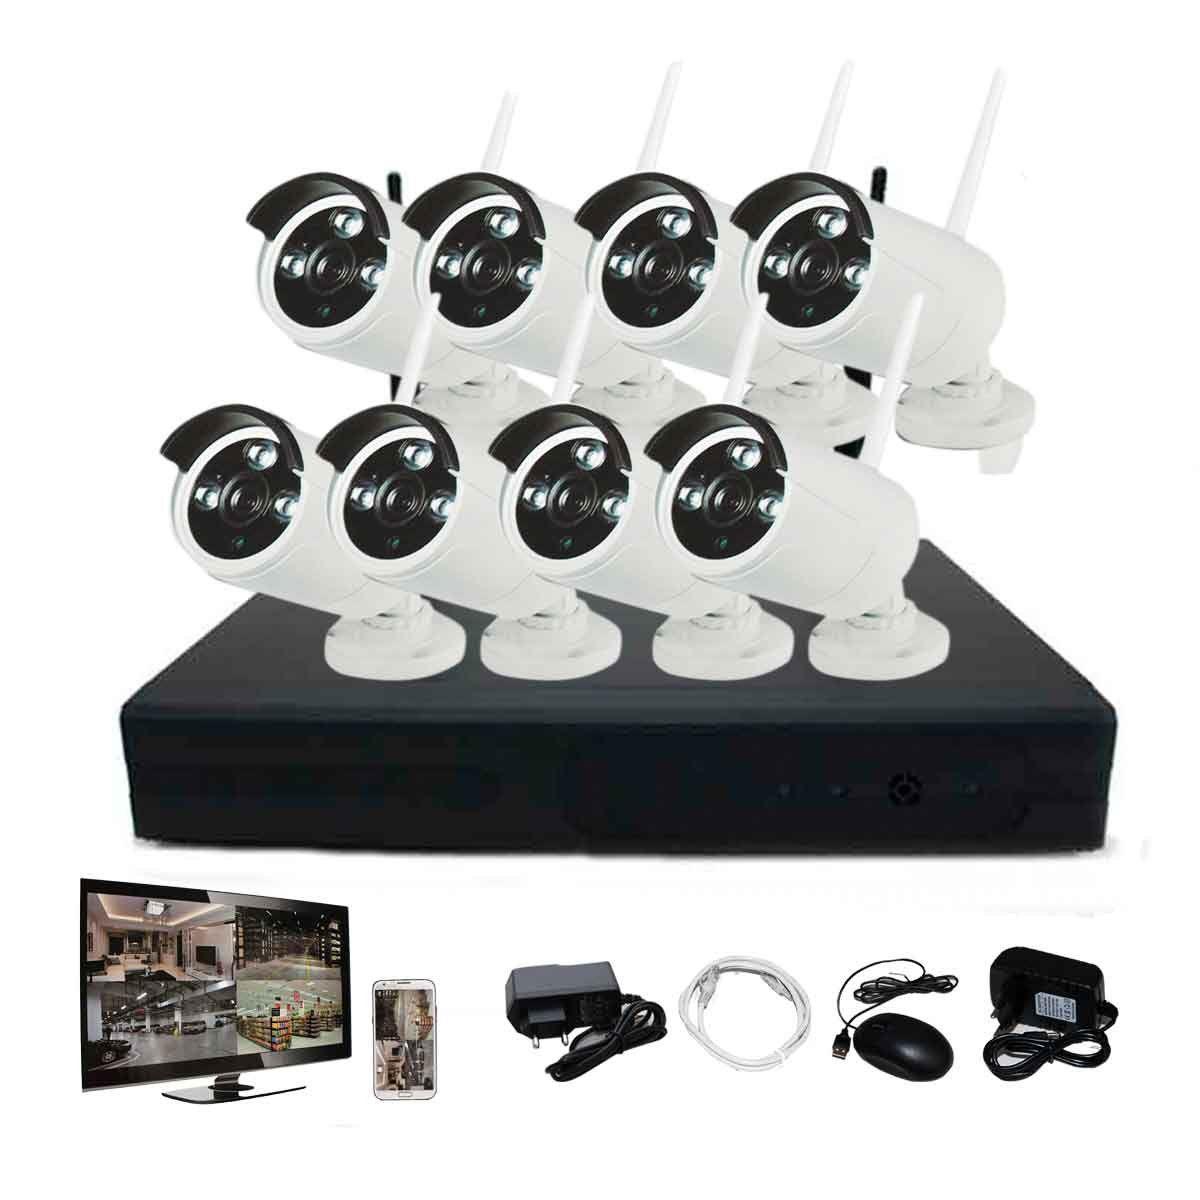 Kit Nvr 8 Câmeras Infra Wi-fi Hd 960p P2p Rgb Sem Fio 10-20m